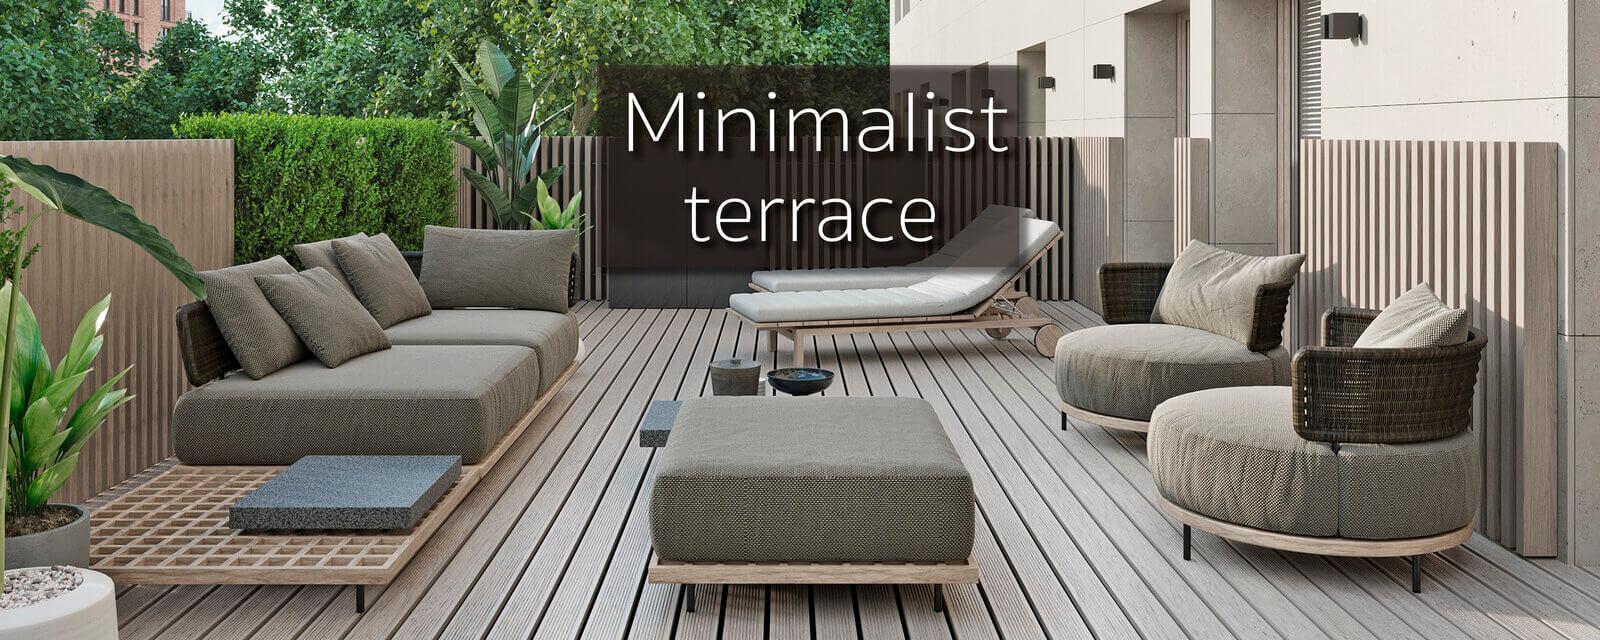 Minimalist | Terrace